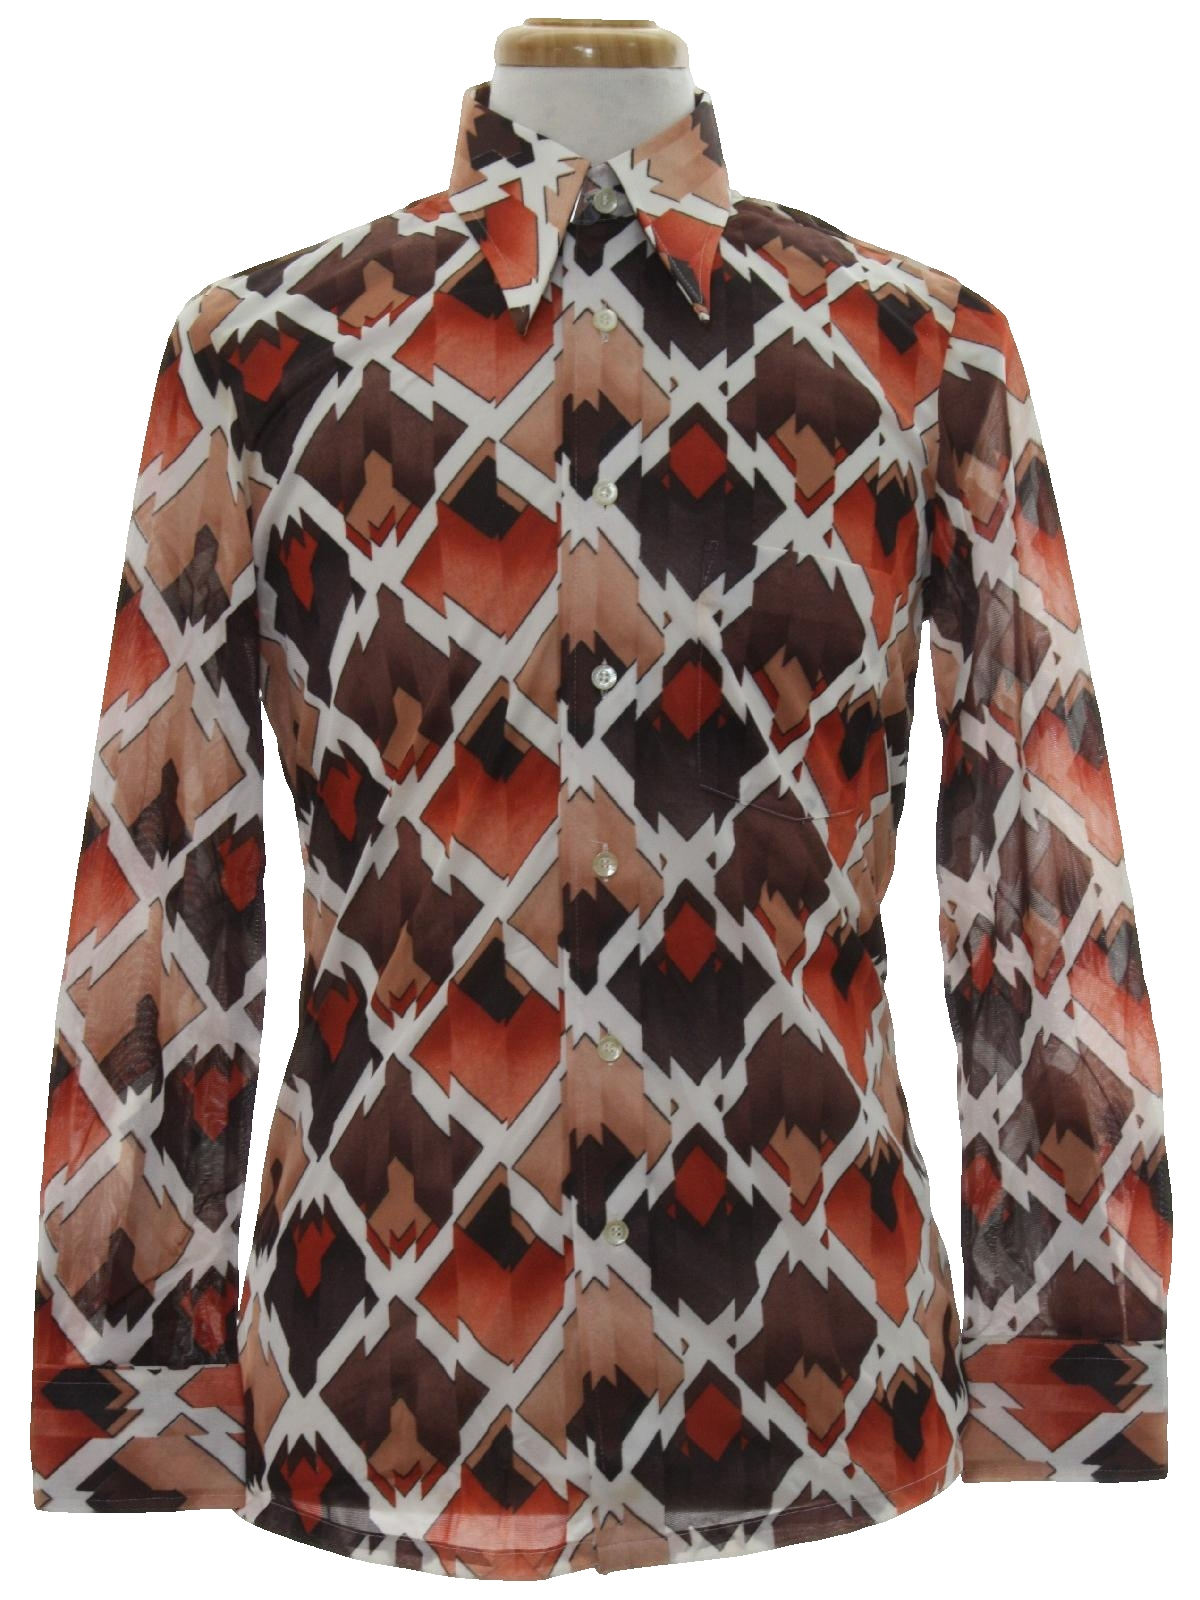 70s Print Disco Shirt Oleg Cassini By Burma Designer